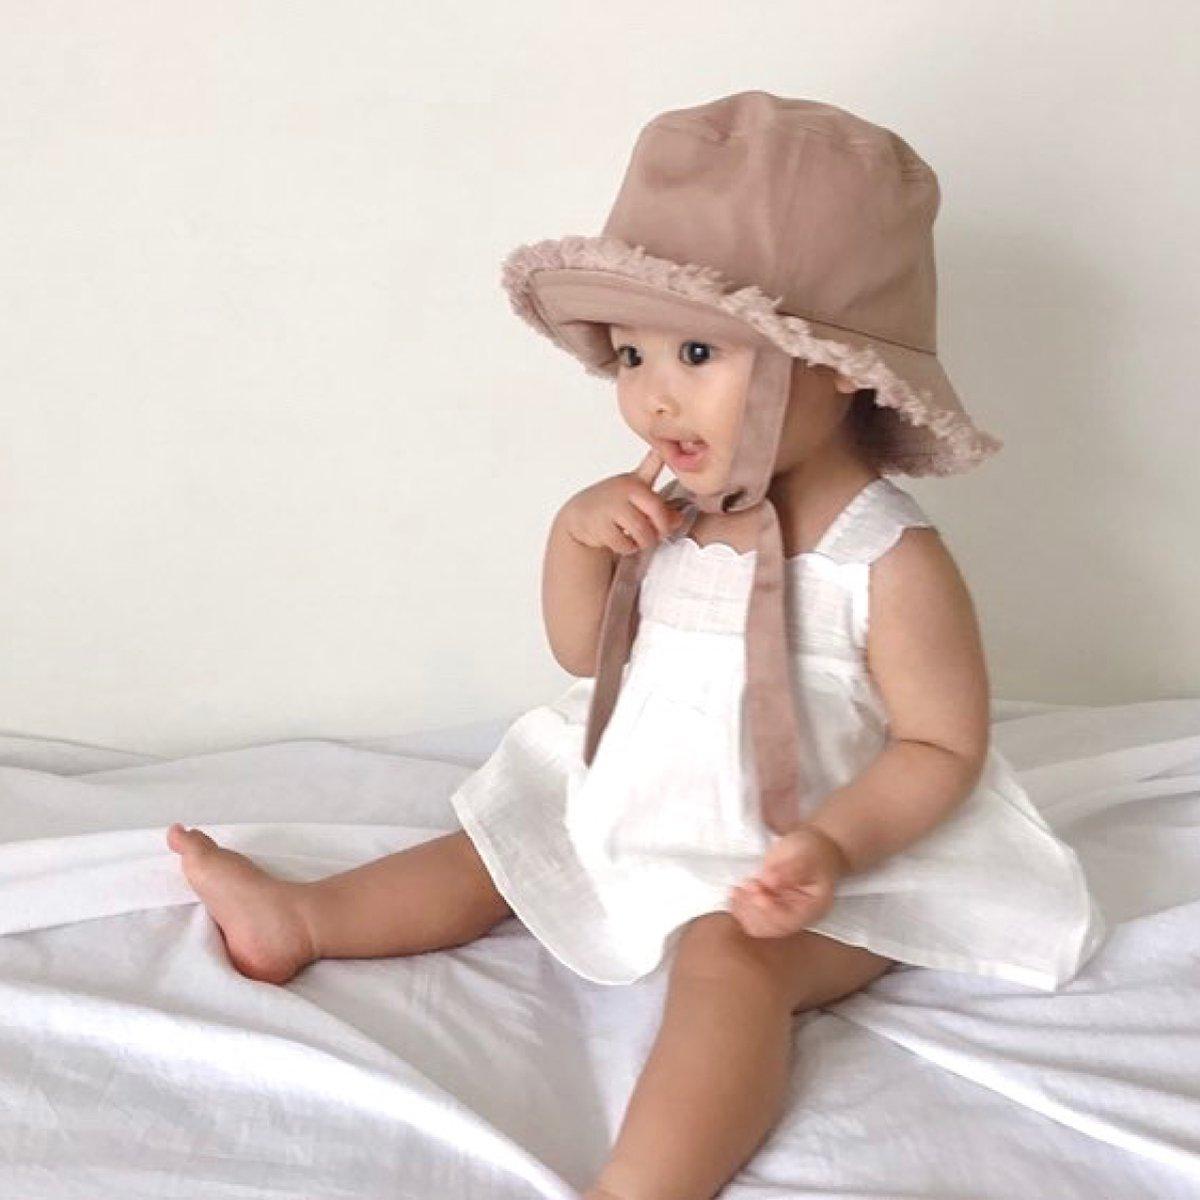 【BABY】Baby Fringe Hat 詳細画像29